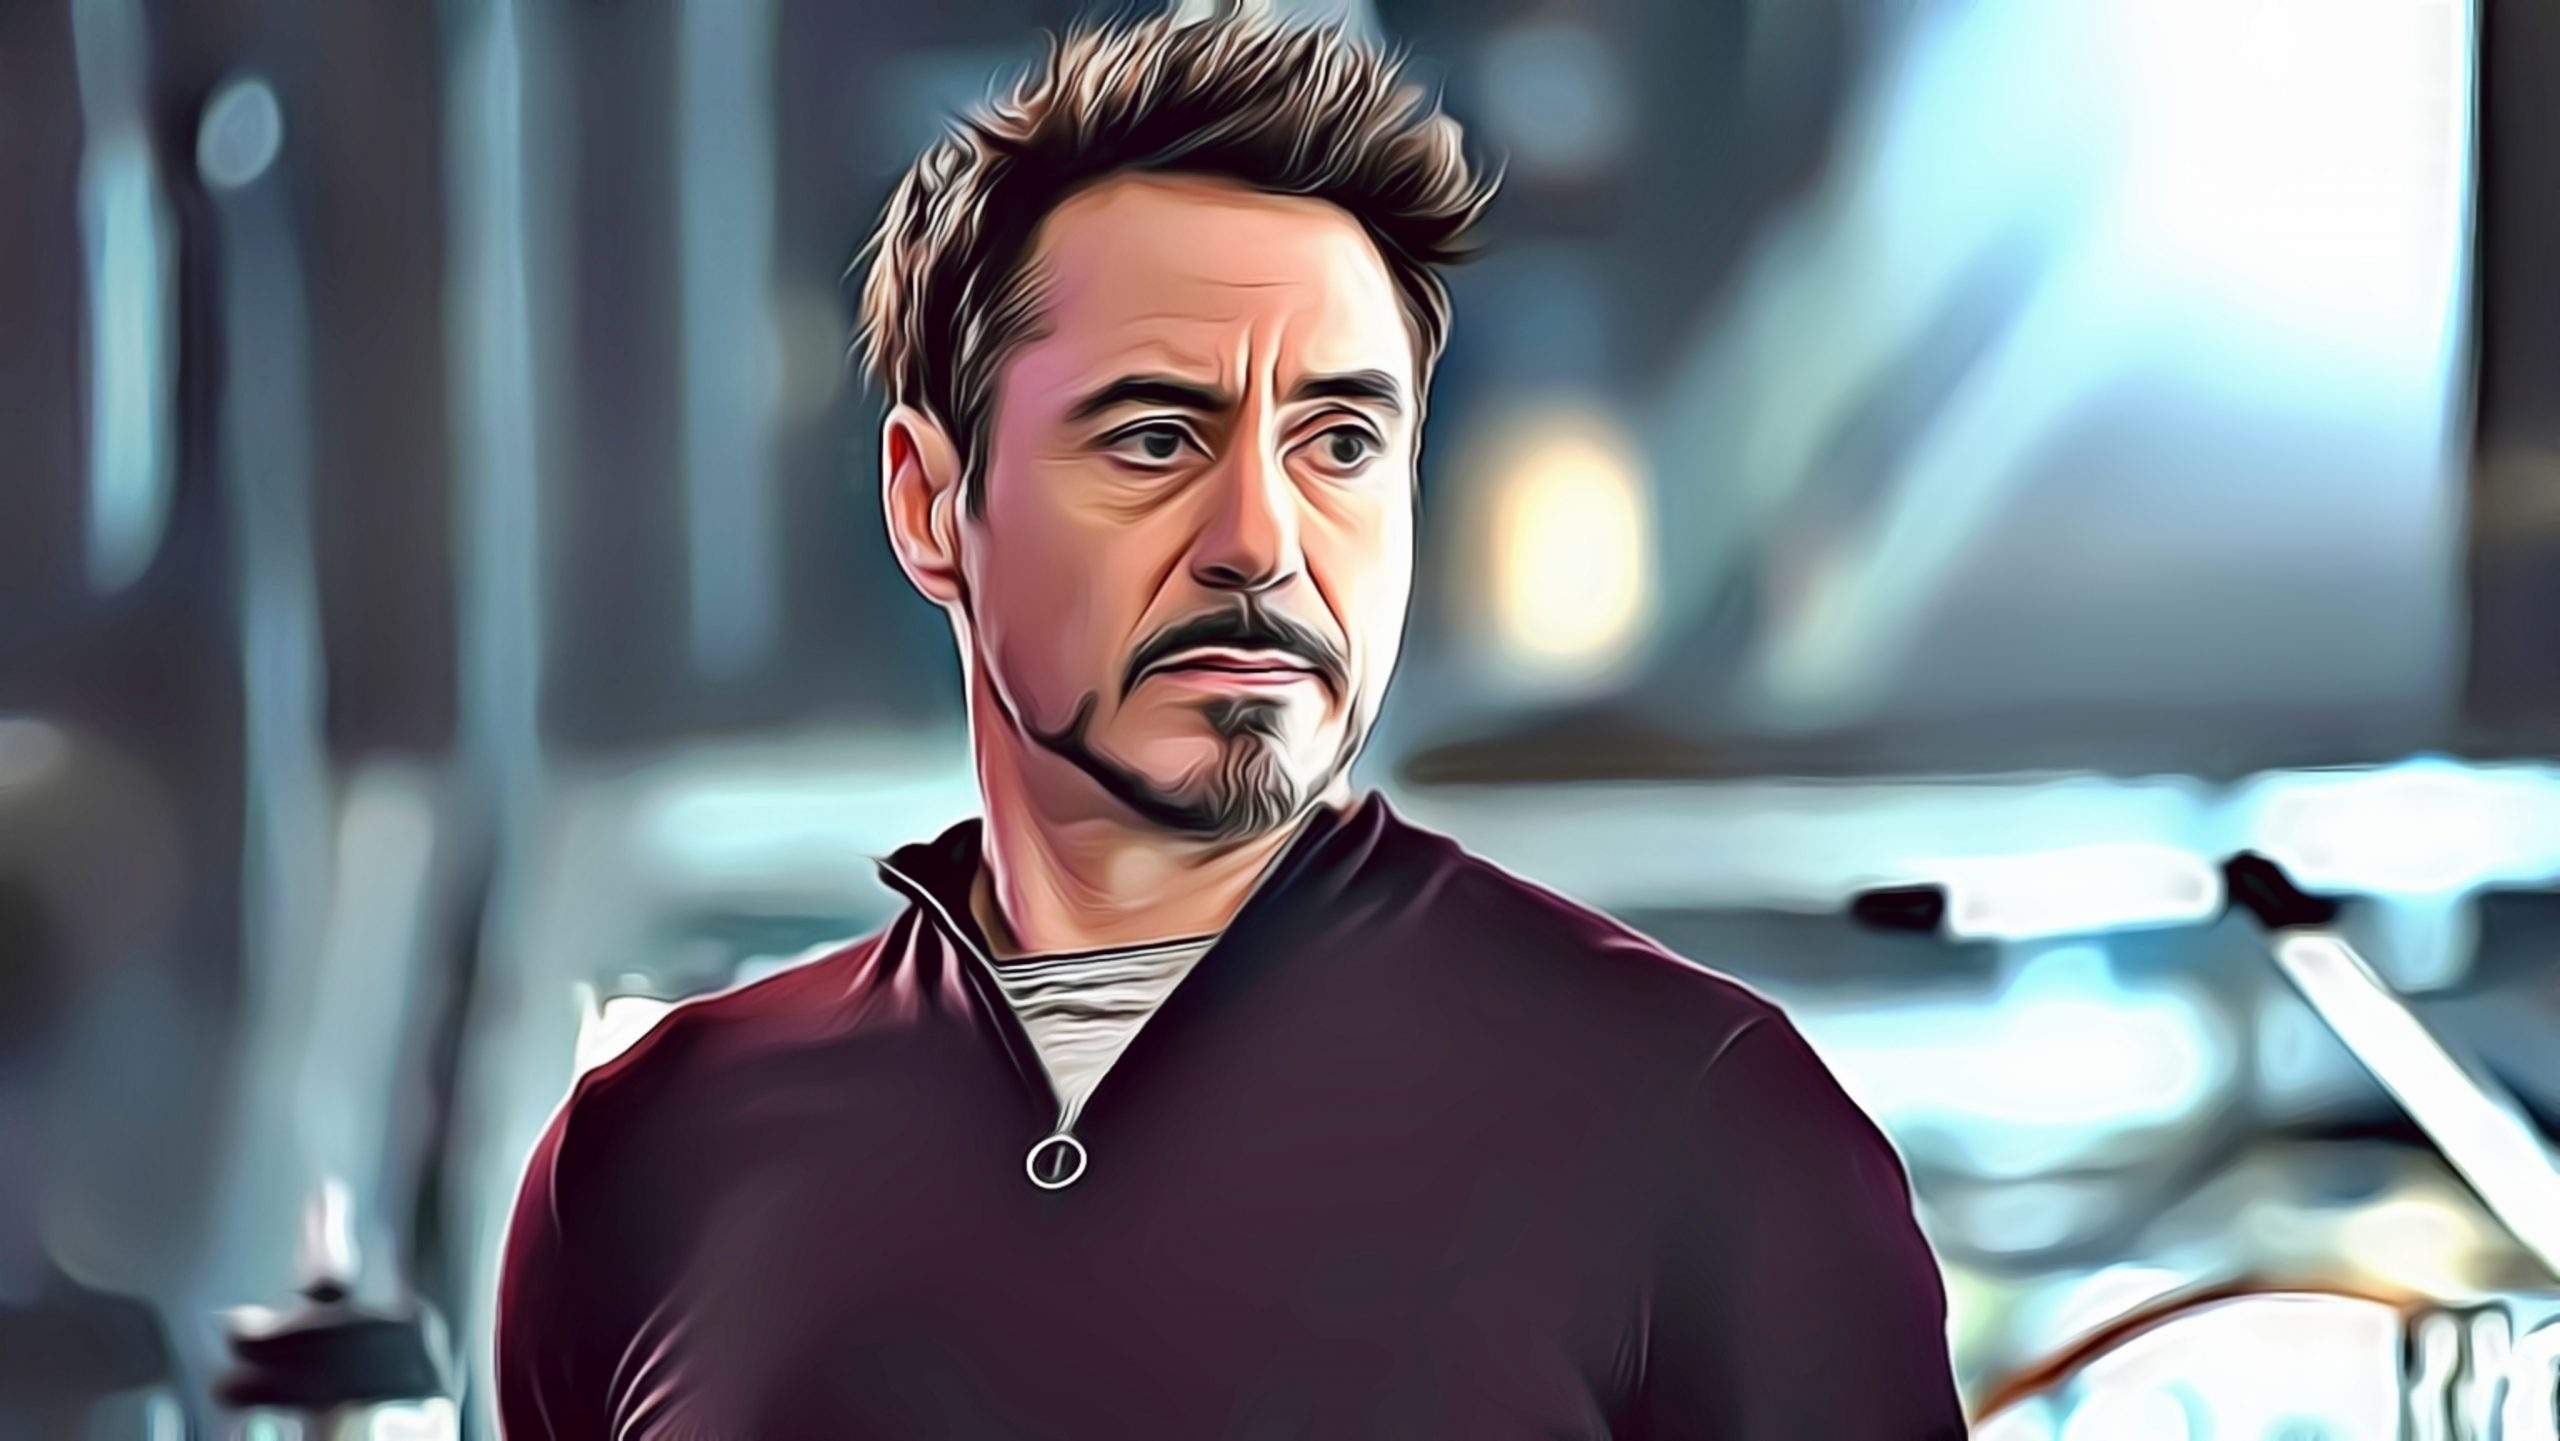 Robert-Downey-Jr-Net-worth